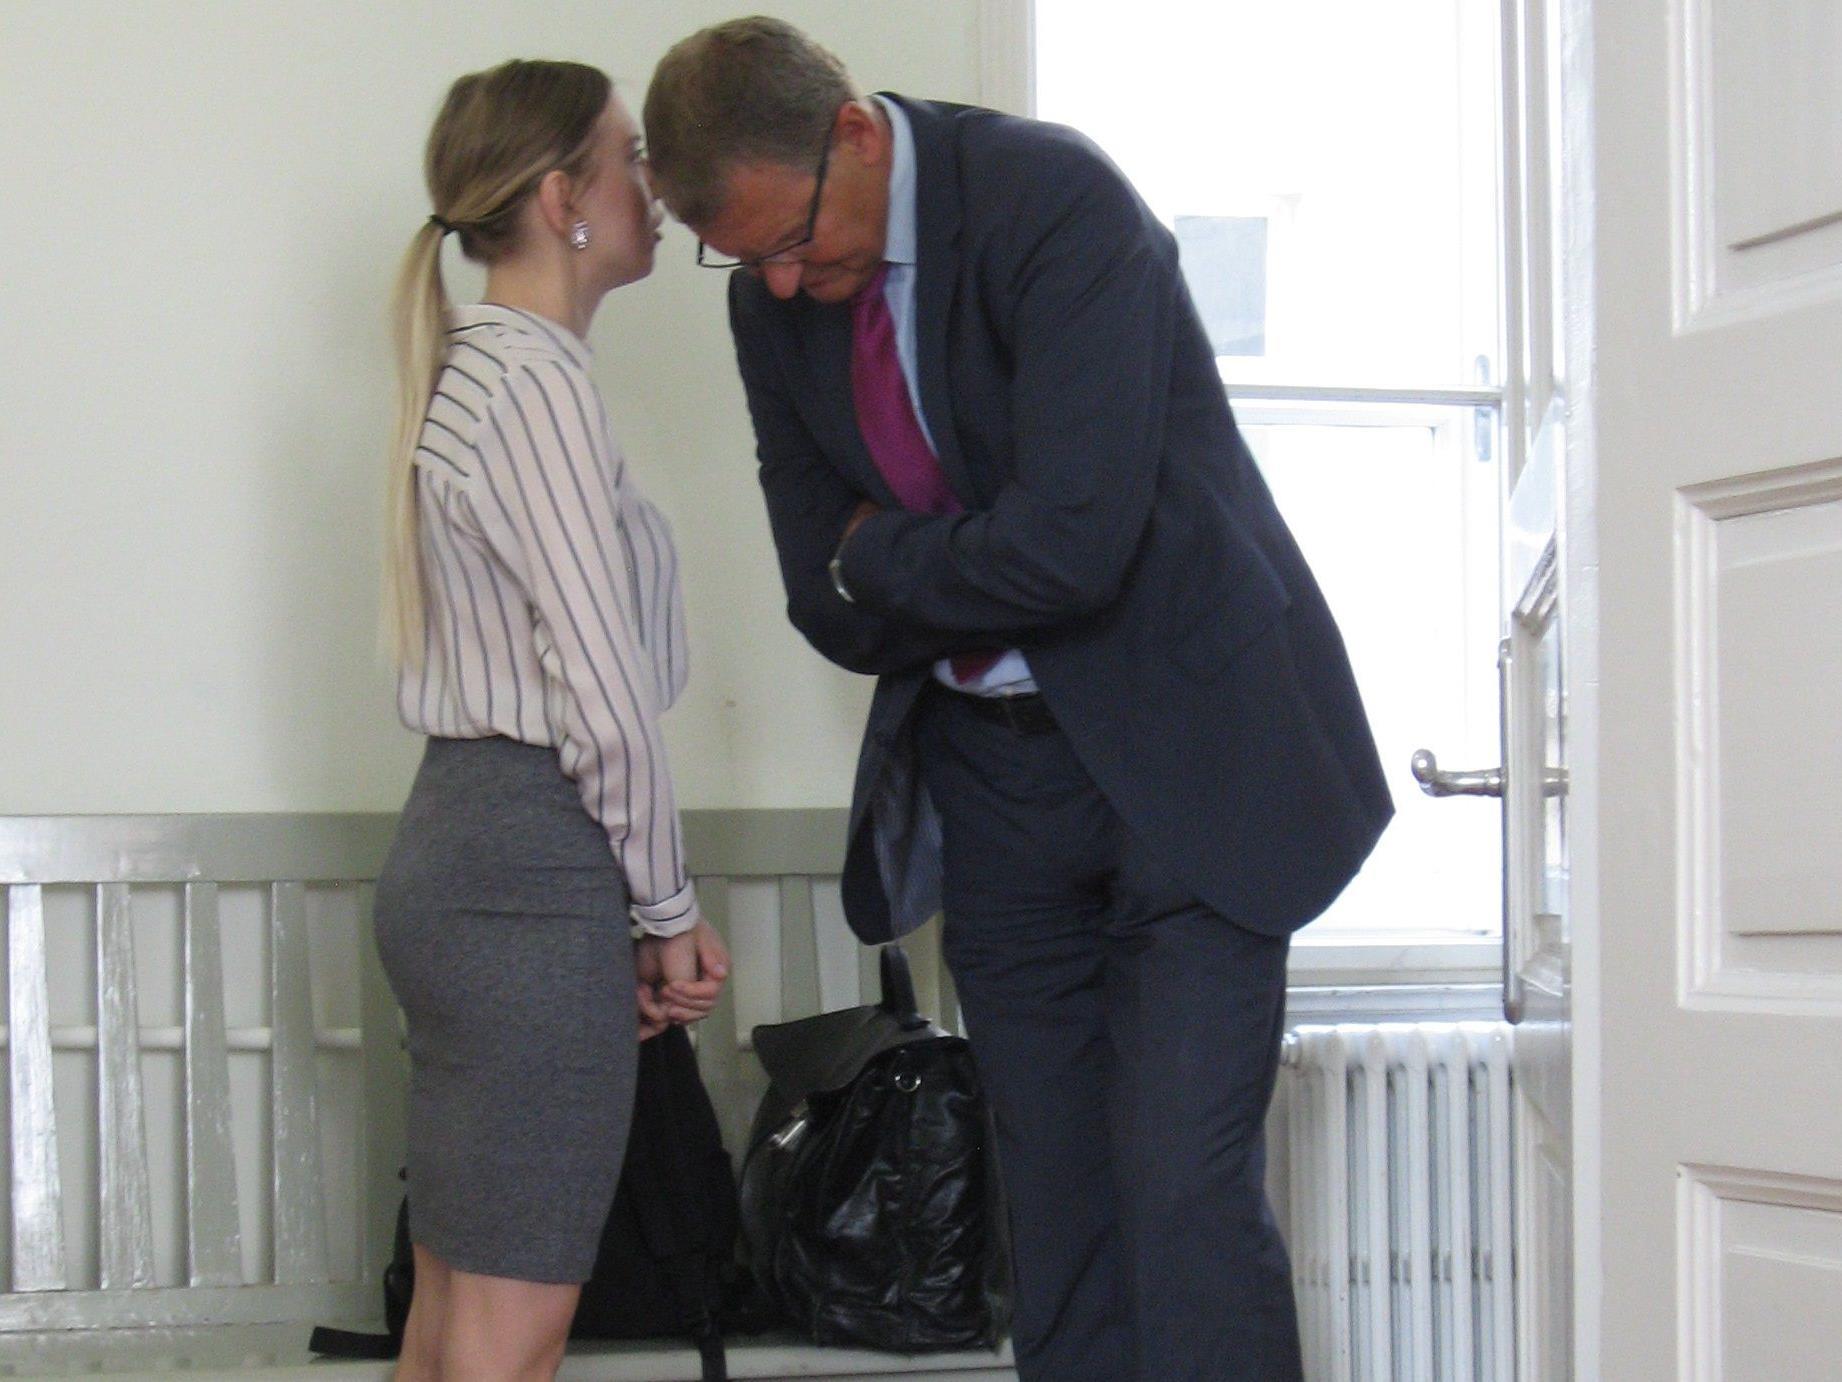 Anwalt Andreas Ermacora und Klägerin Kristina V.